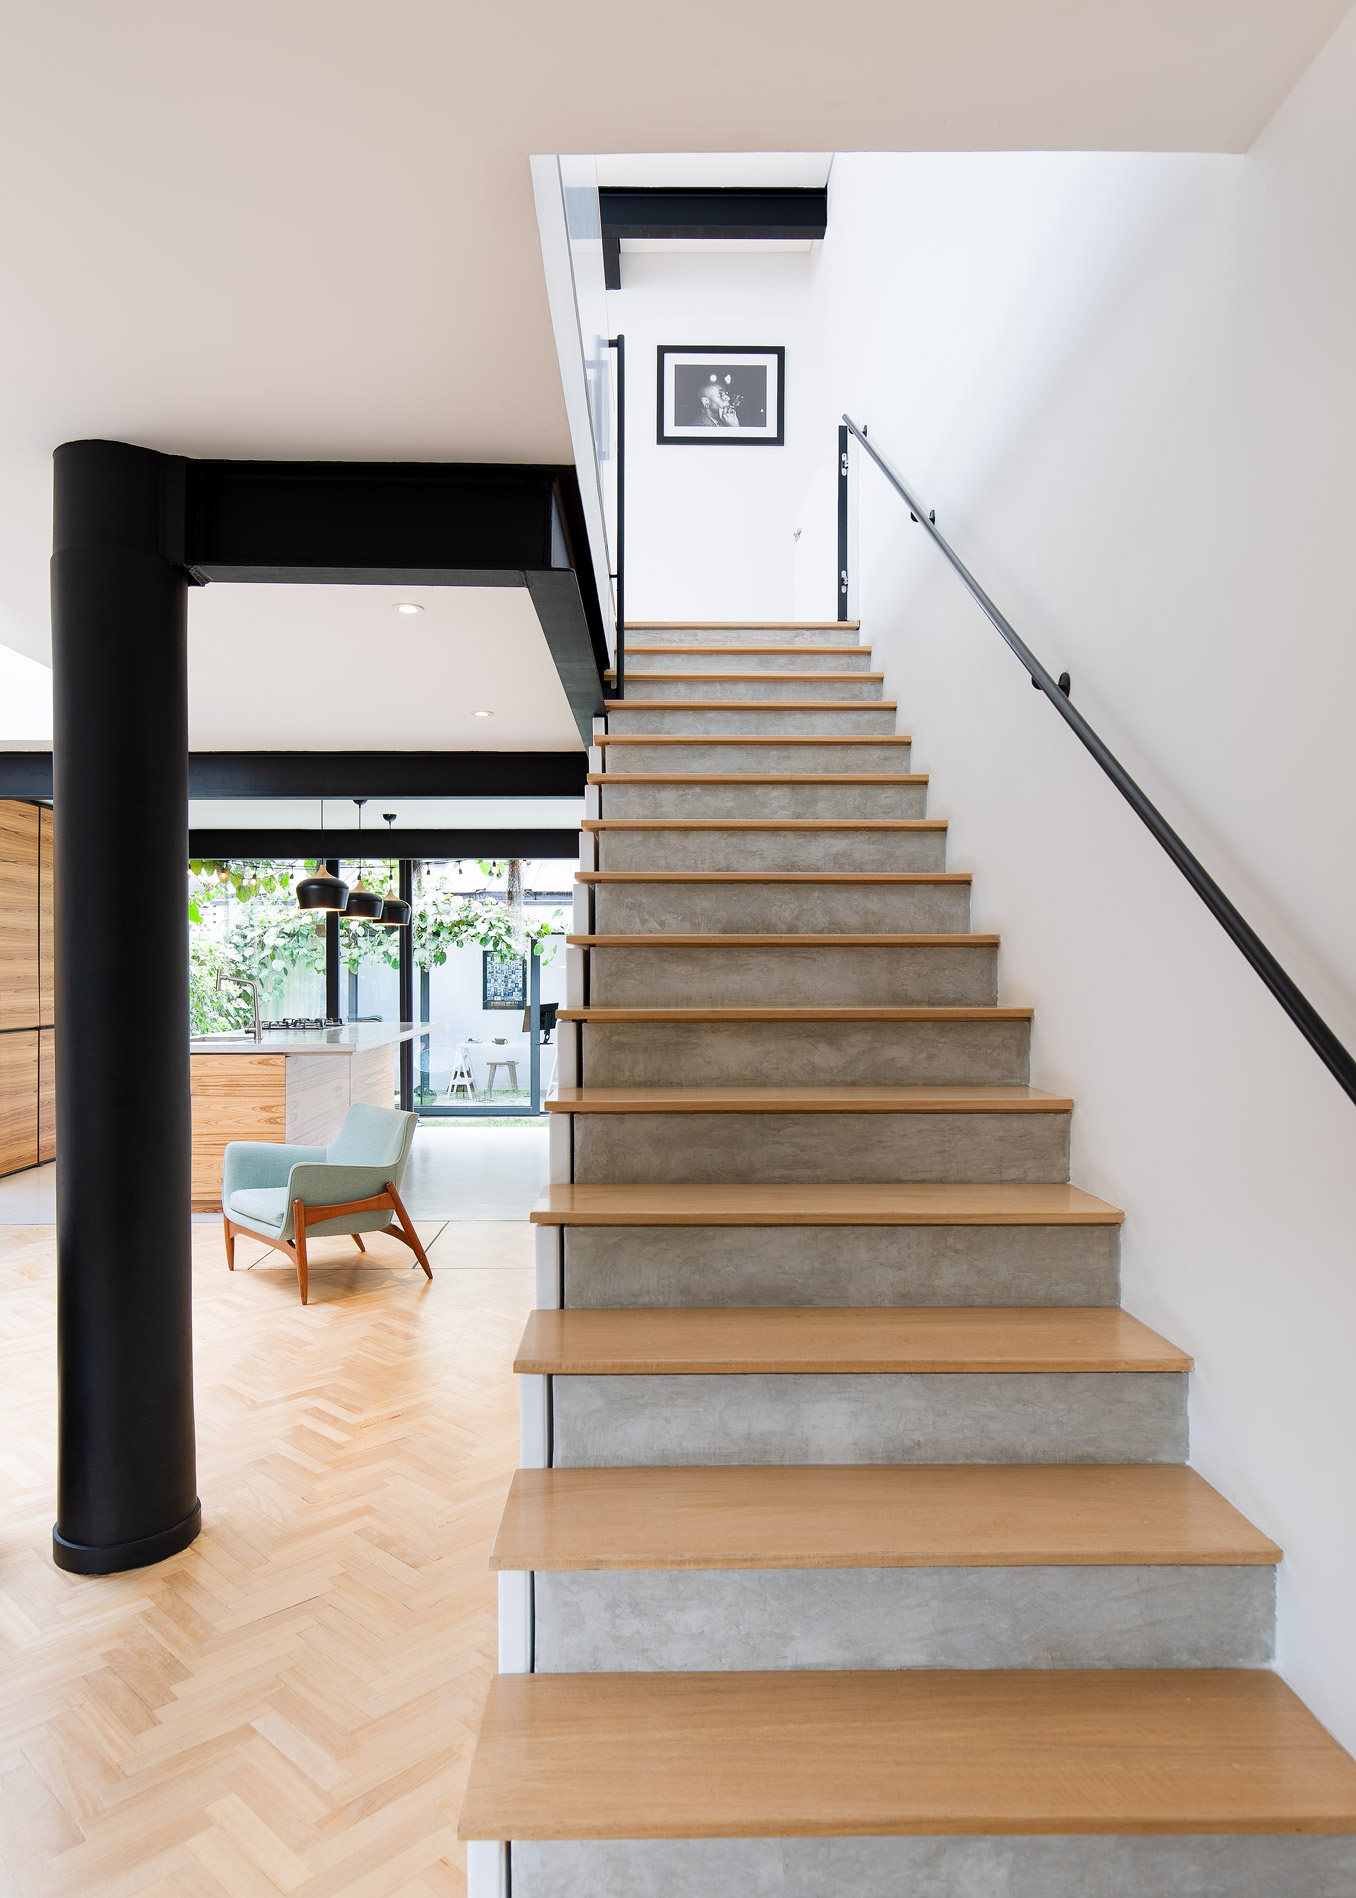 19.oberlaenderarquitectos.arquitectura.simonboschphotography.simon.bosch.bogota.interior.habitar